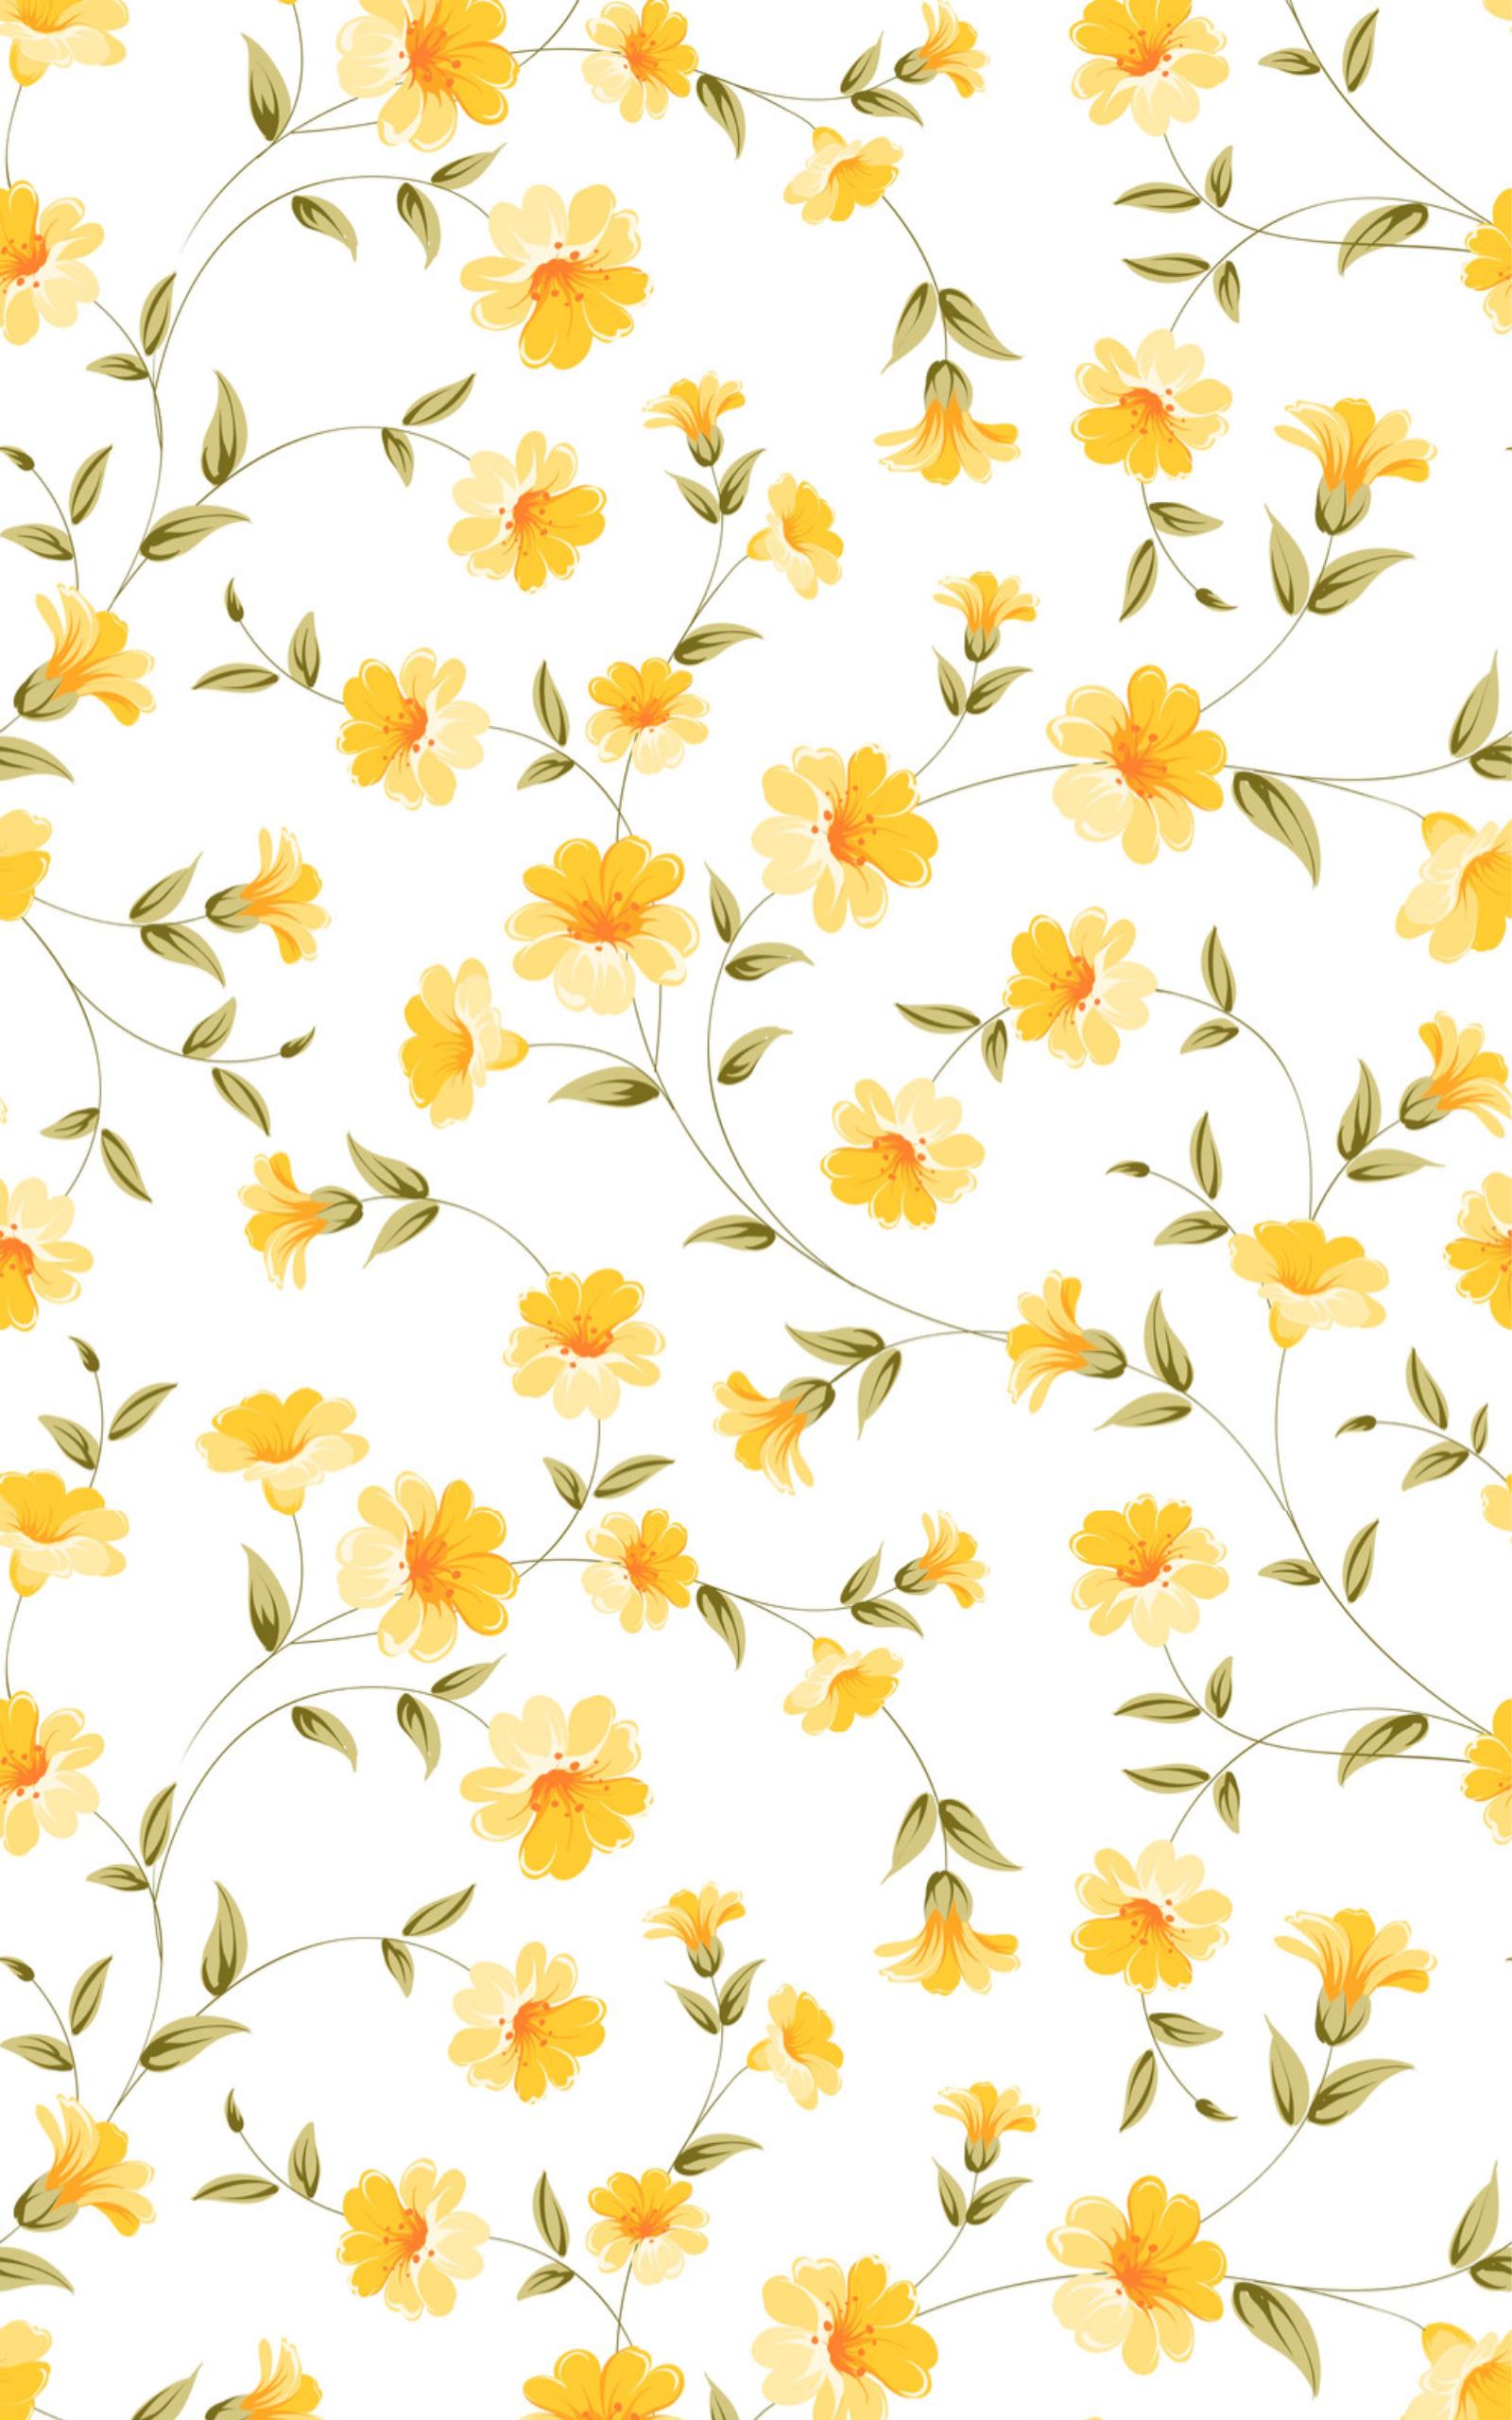 Yellow Flower Wallpaper